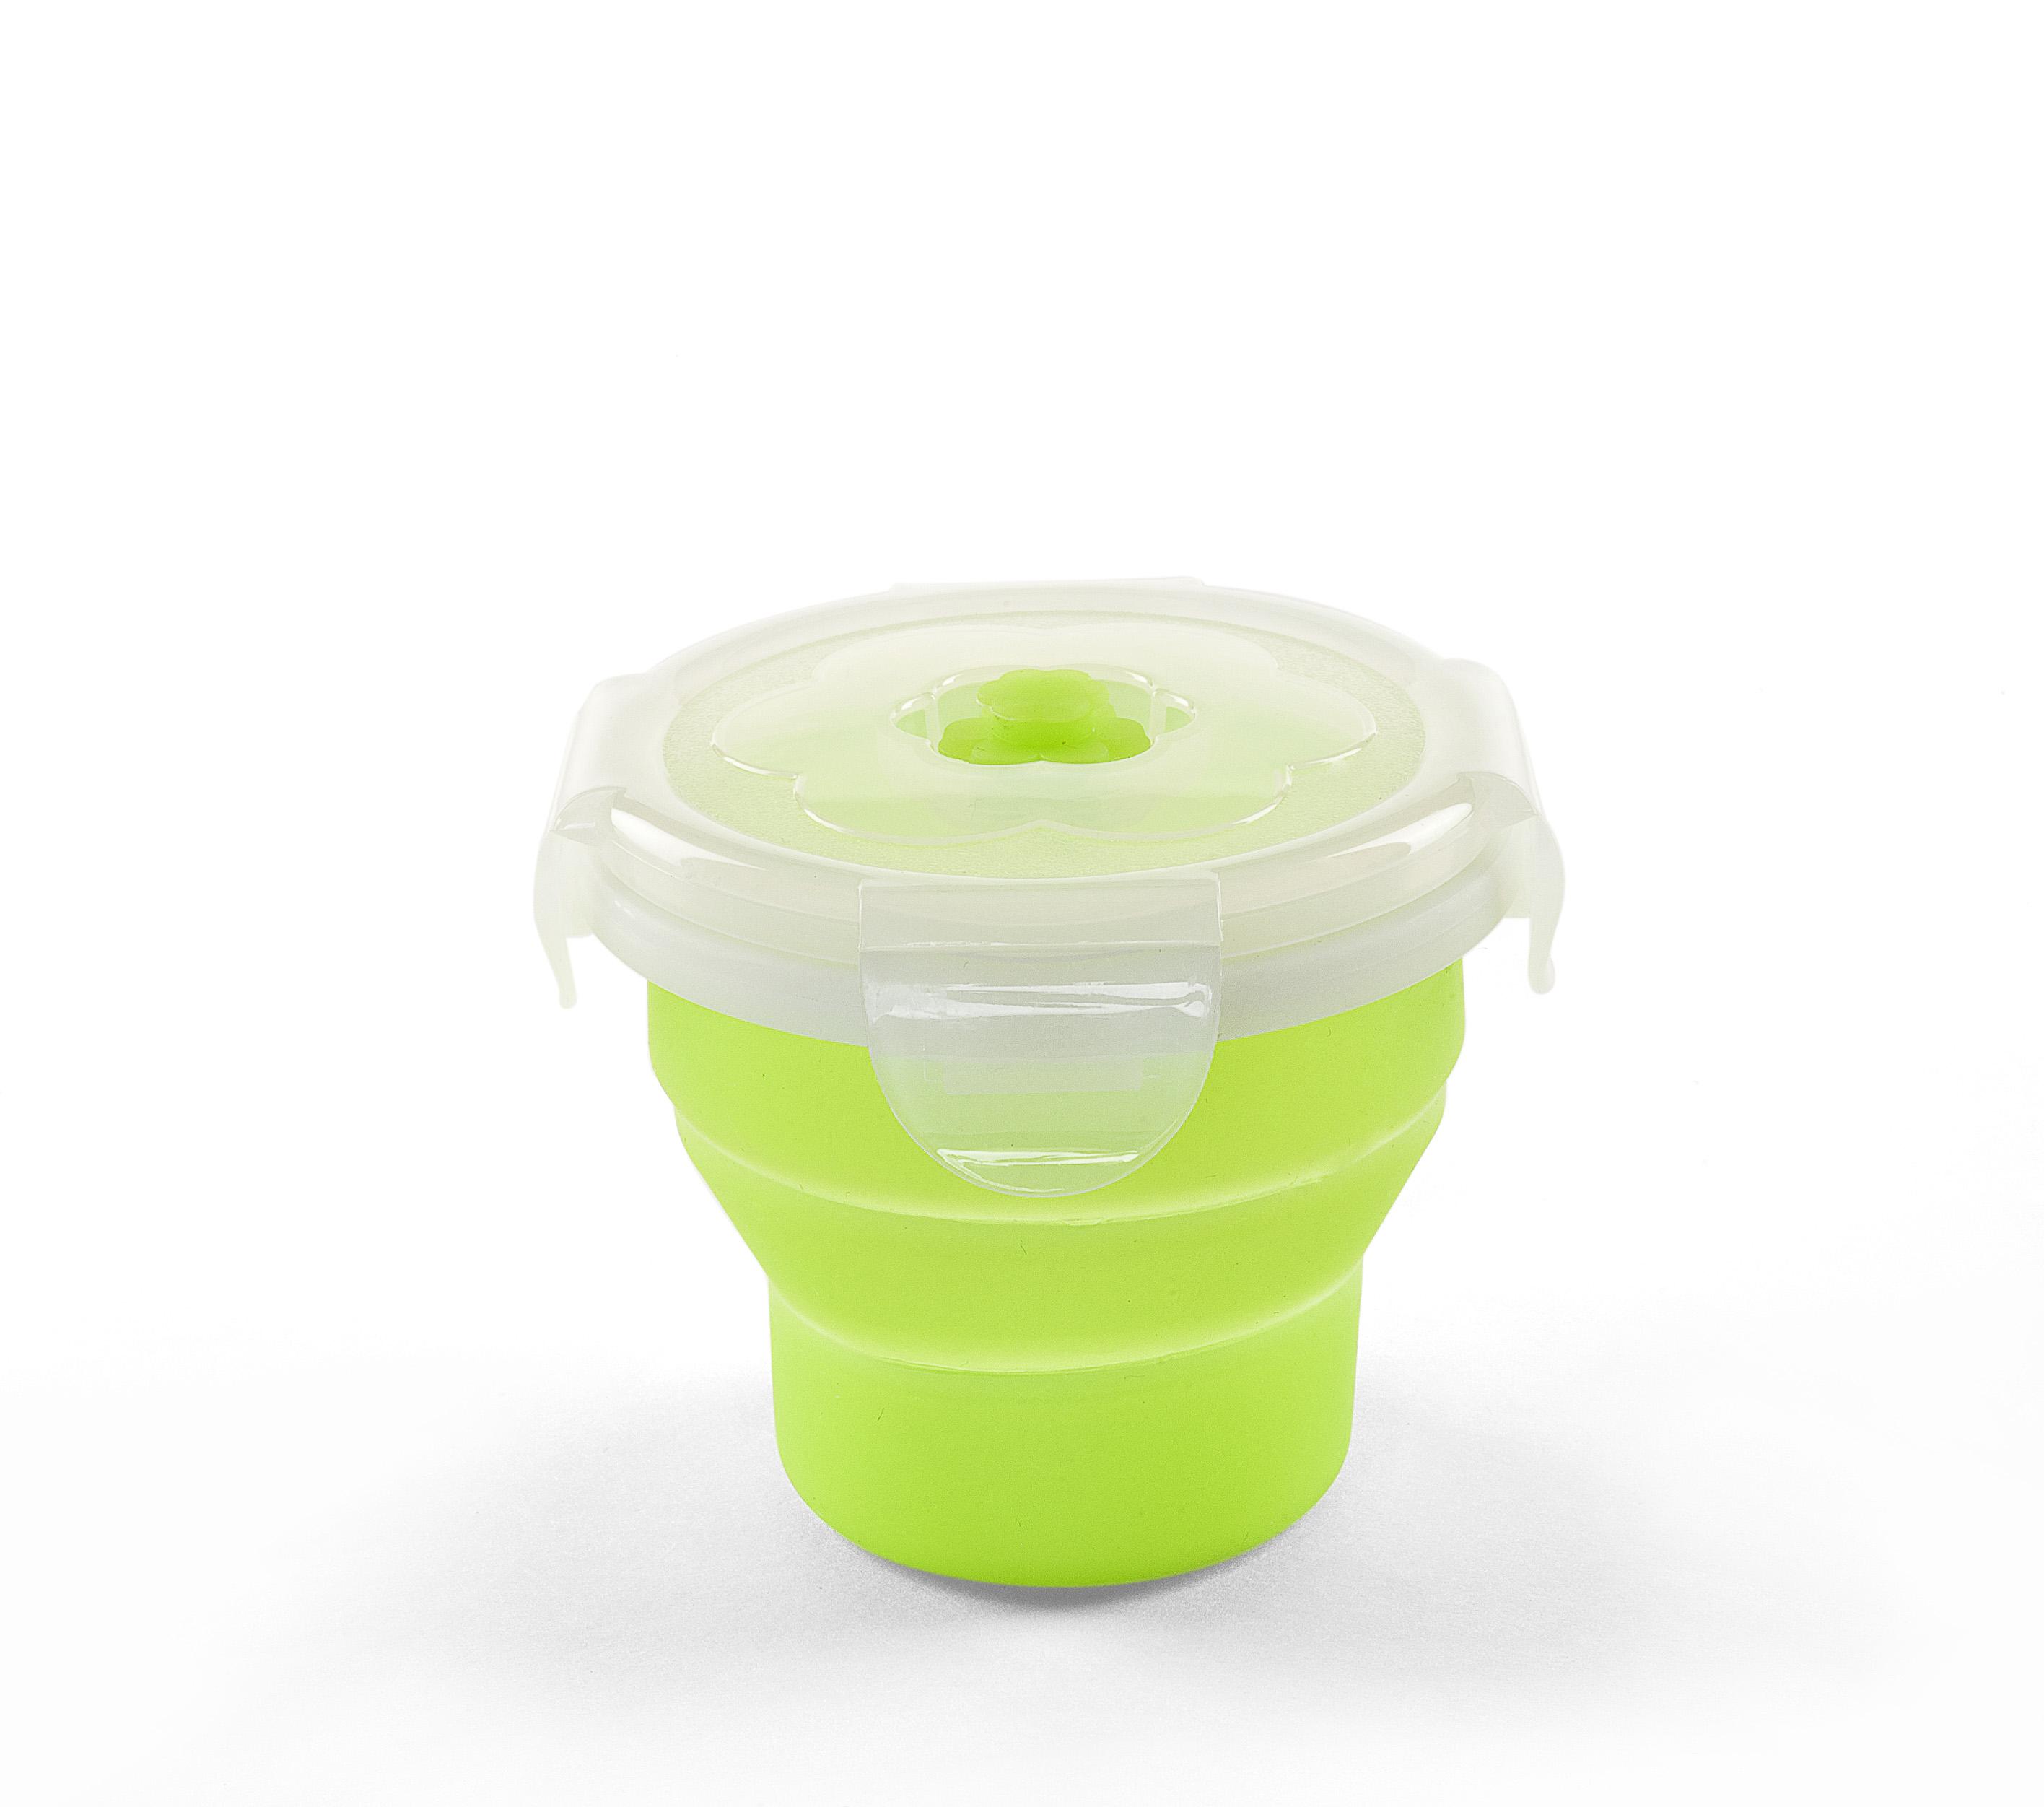 Skládací silikonová miska 230ml, Greenn